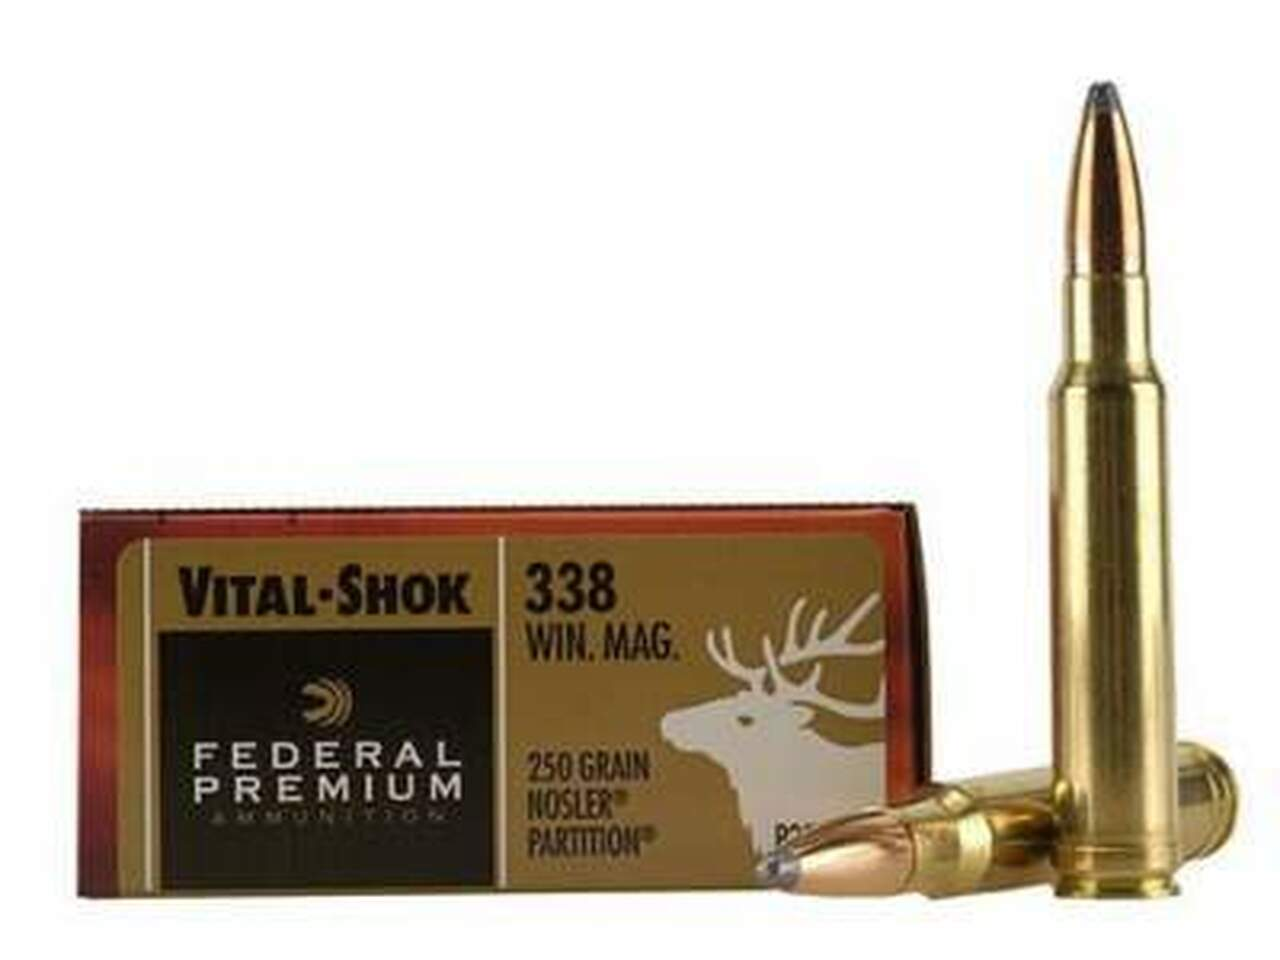 Rifle Ammo | Rifle Ammunition For Sale In Bulk Quantity